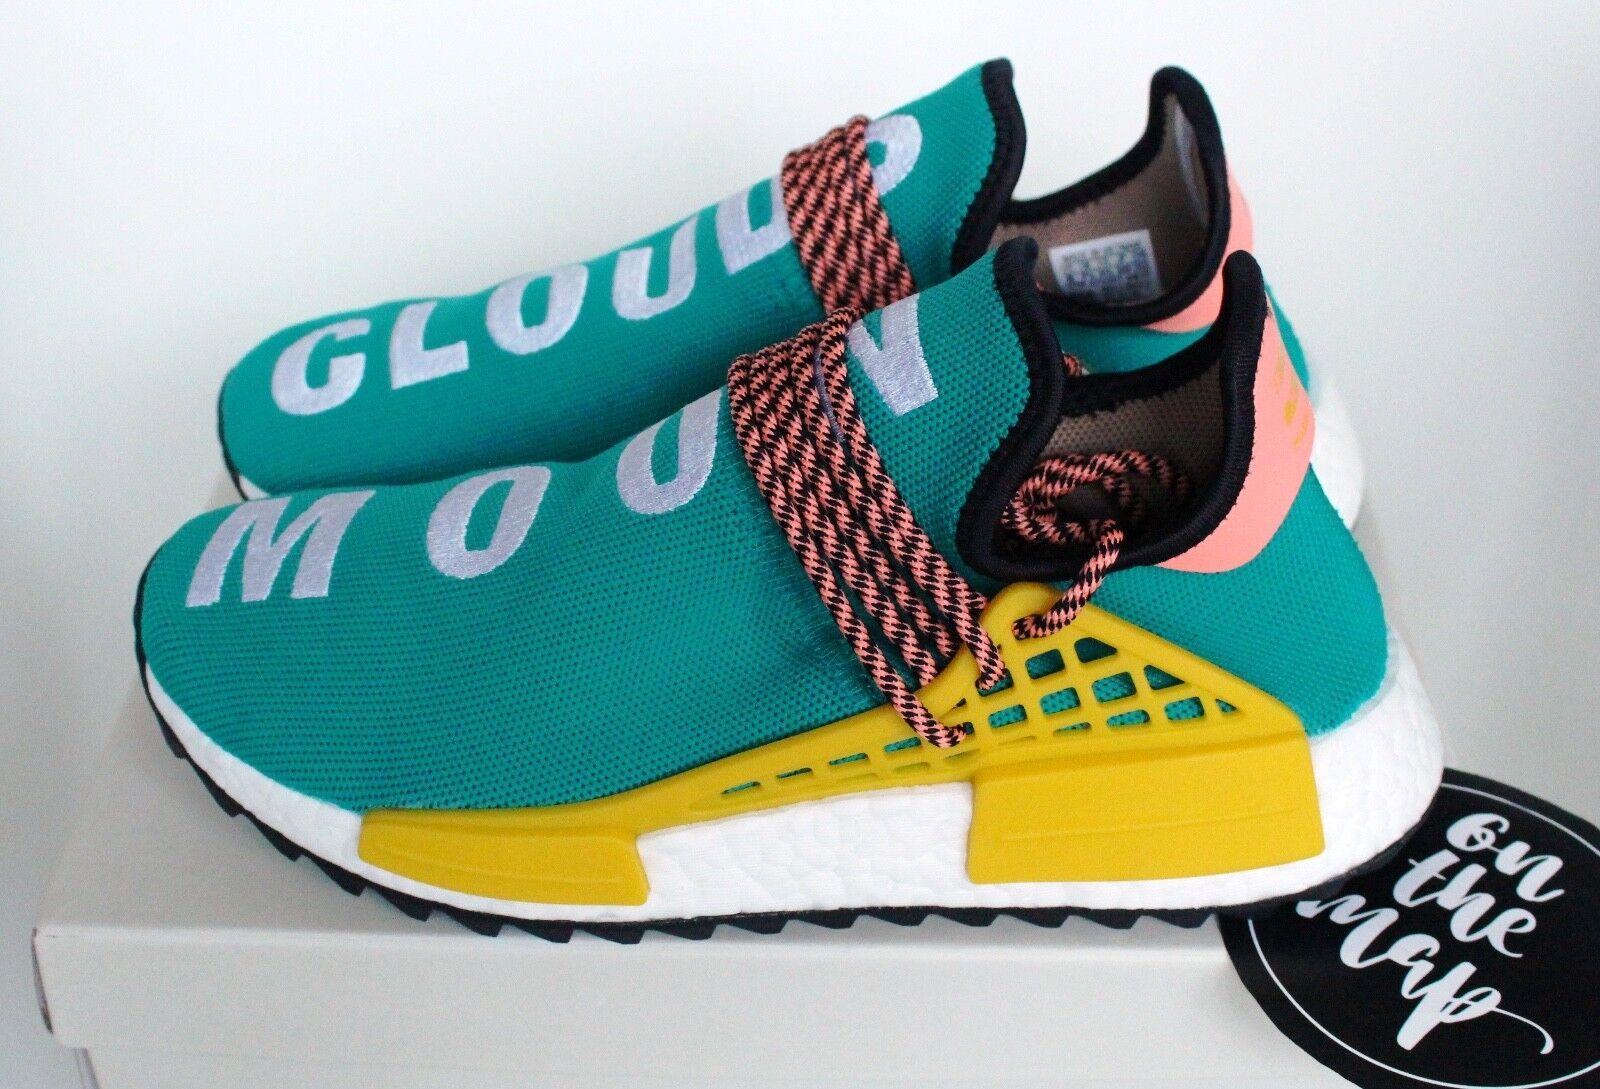 Adidas Pharrell raza humana Hu NMD Glow Trail Teal Verde Sun Glow NMD 5 7 8 11 10 12 nuevo 64d719